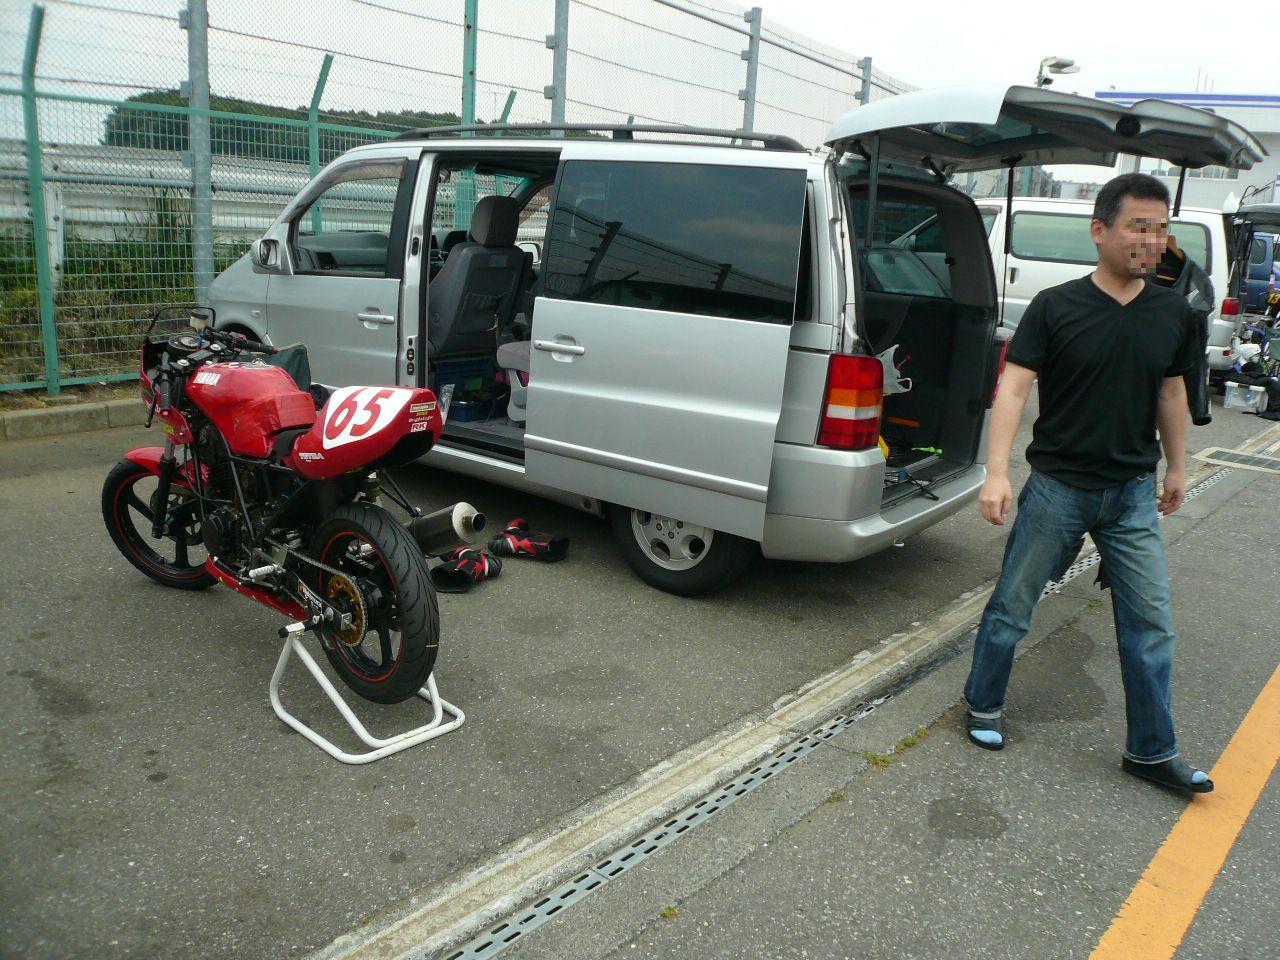 http://img.blogs.yahoo.co.jp/ybi/1/13/f5/tetsutaro499/folder/420383/img_420383_48139290_3?1243879277